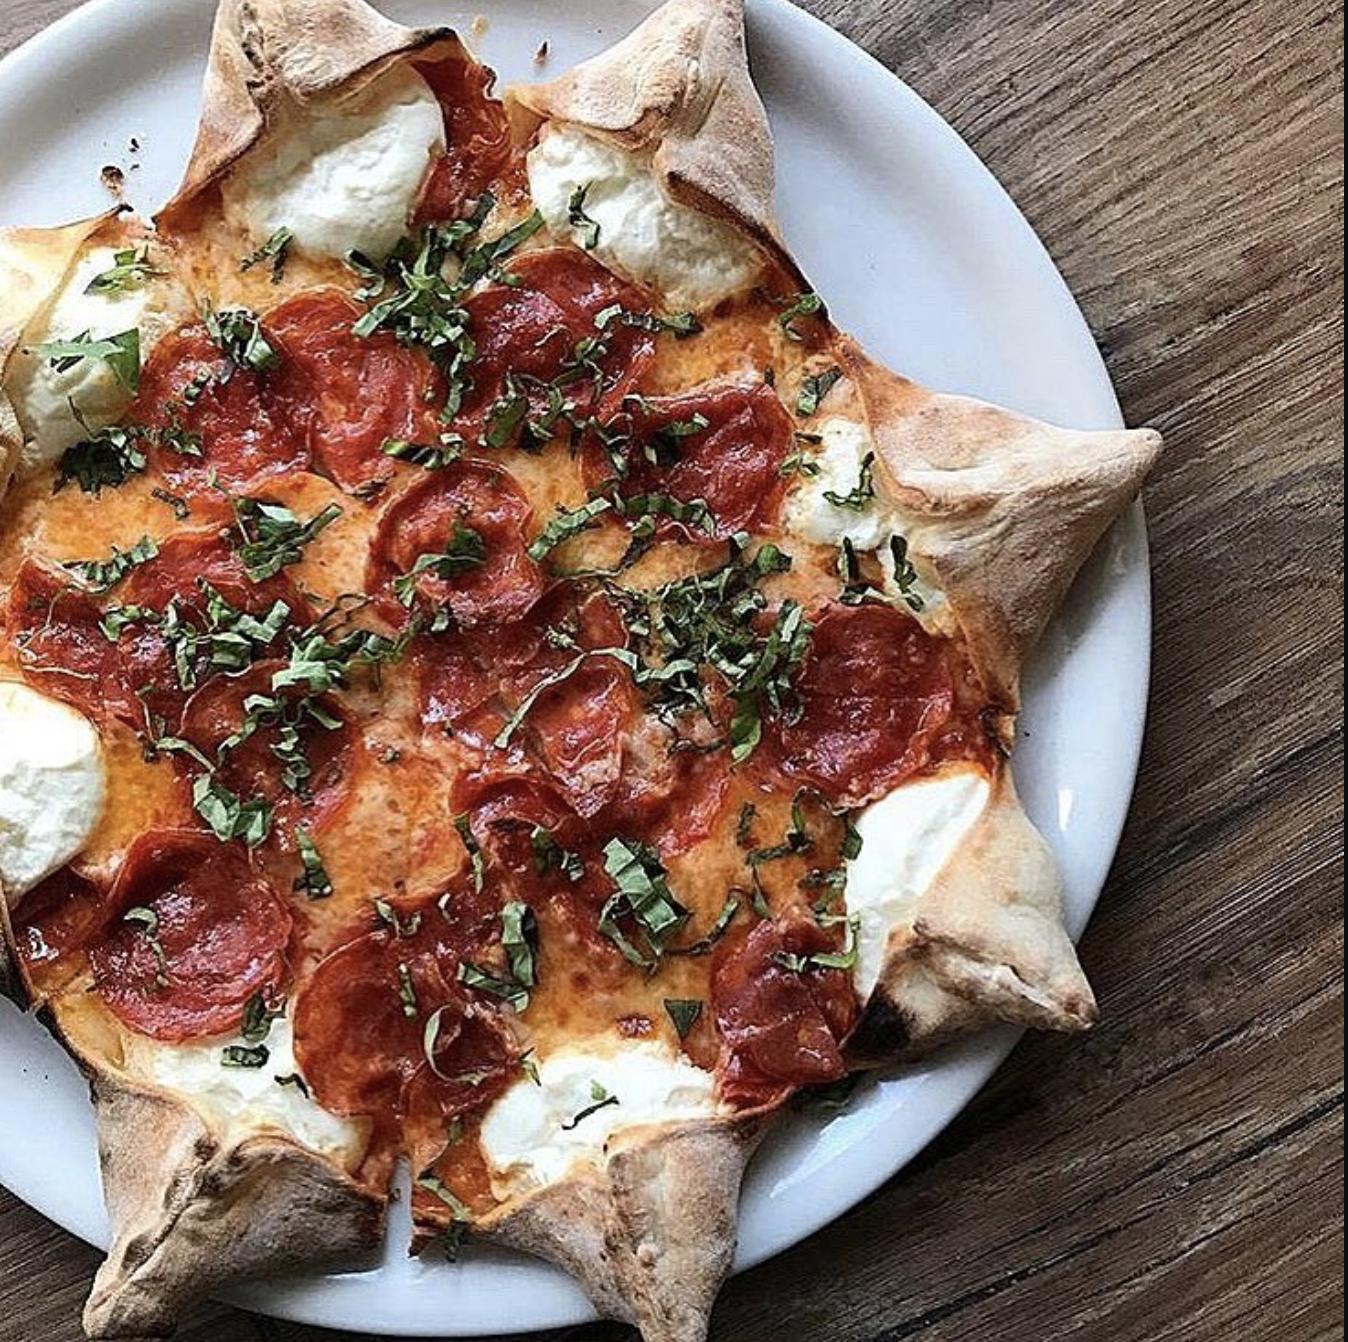 the 5 best pizza spots in Miami